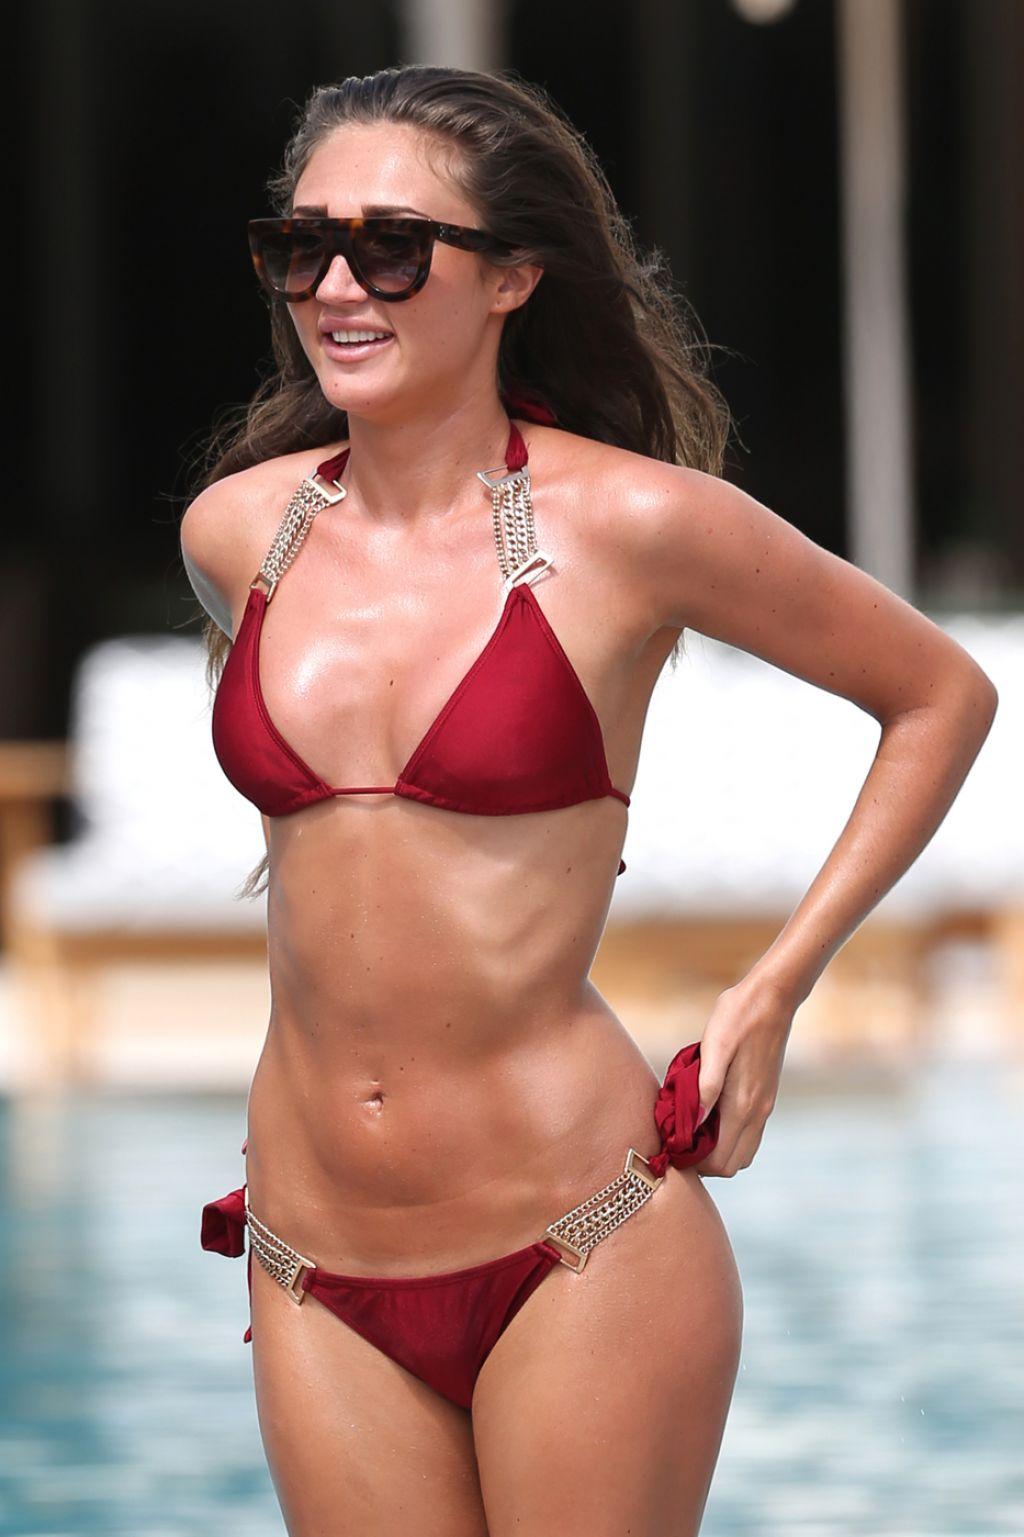 Hottest Bikini Trends Photos: Megan McKenna Hot In Red Bikini